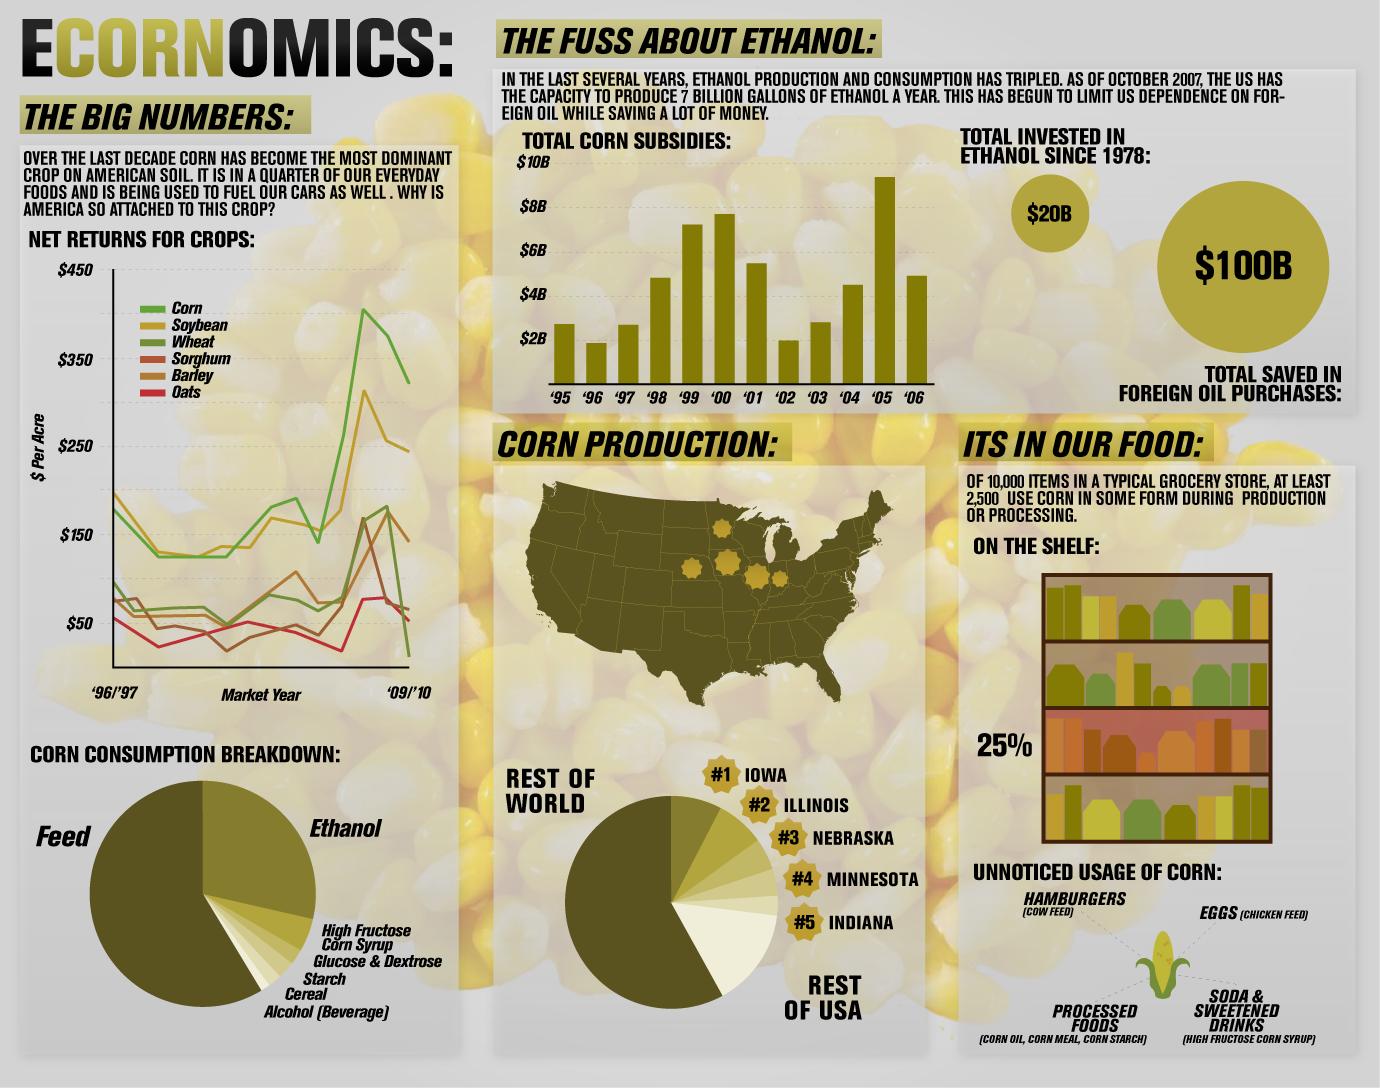 Economics of corn in America